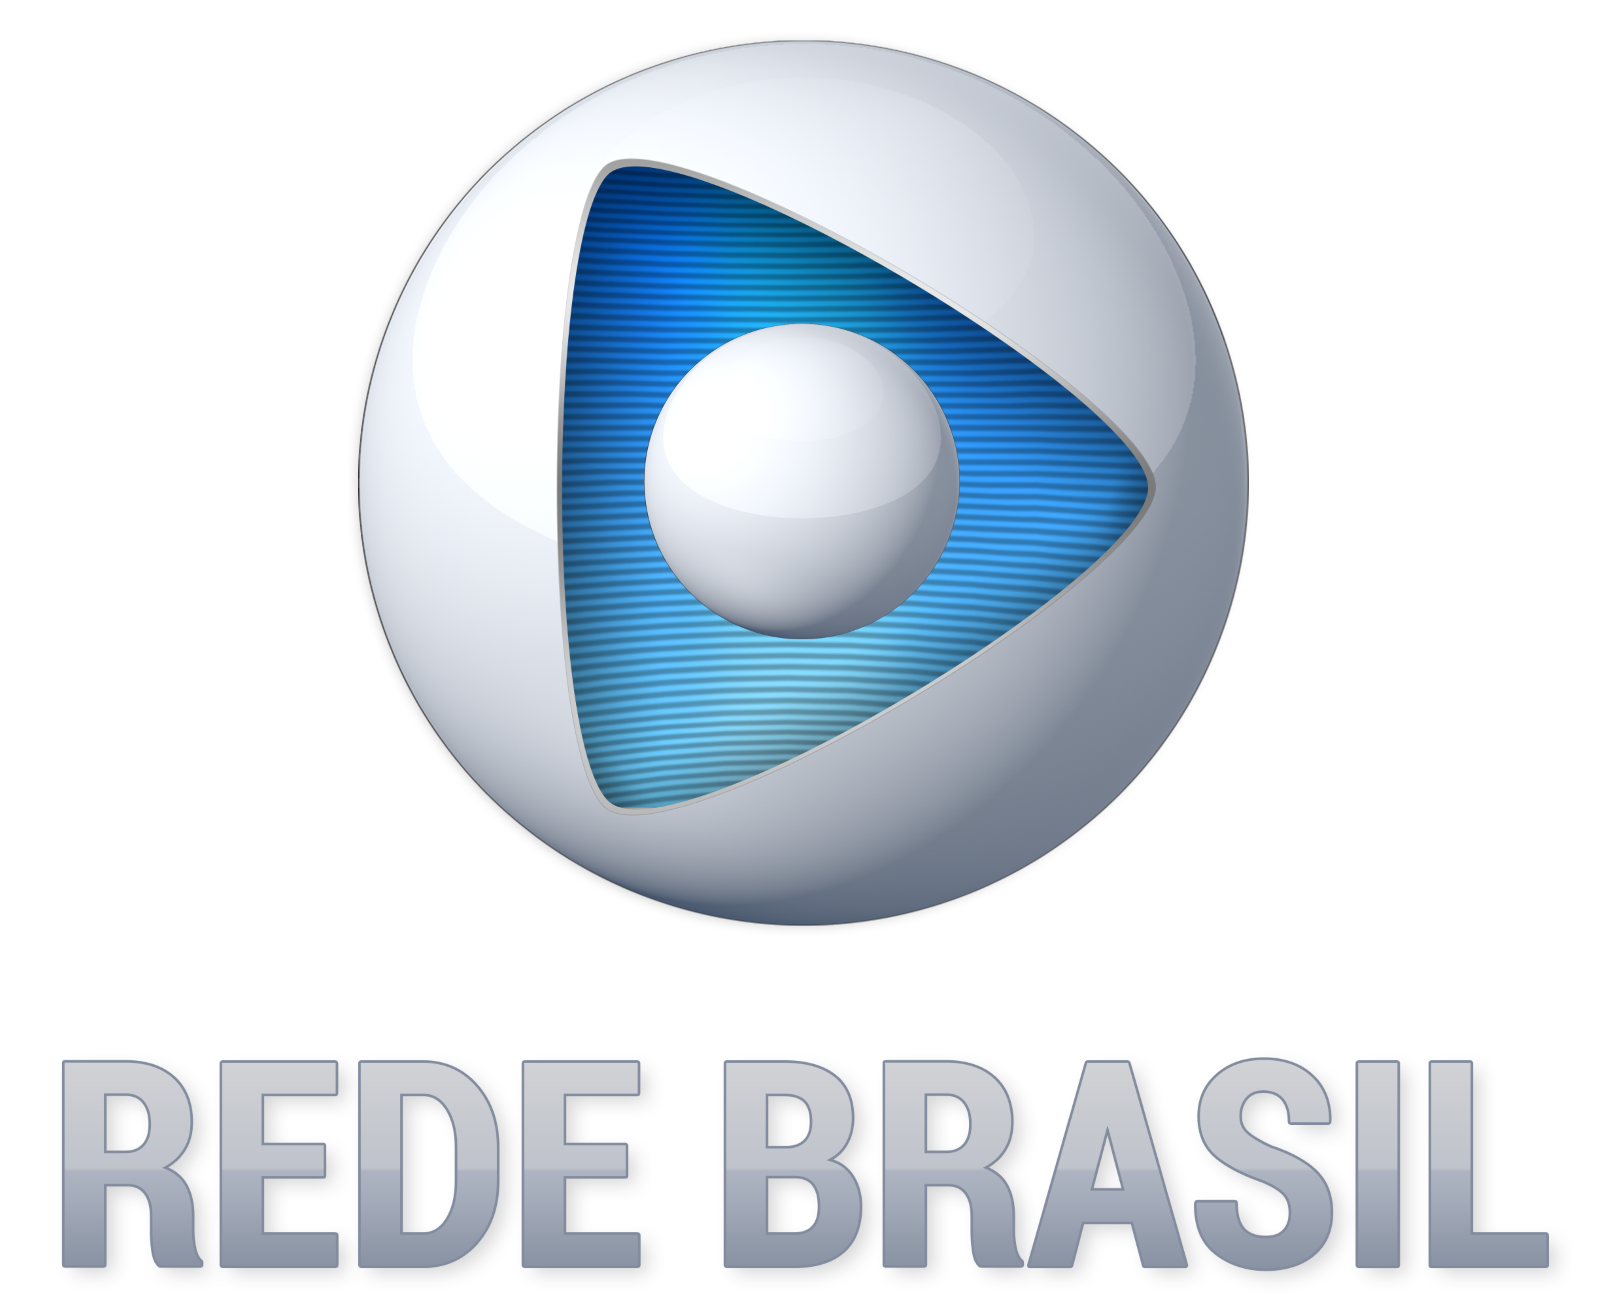 RBTV logo rede brasil 1 - RBTV Logo - Rede Brasil Logo